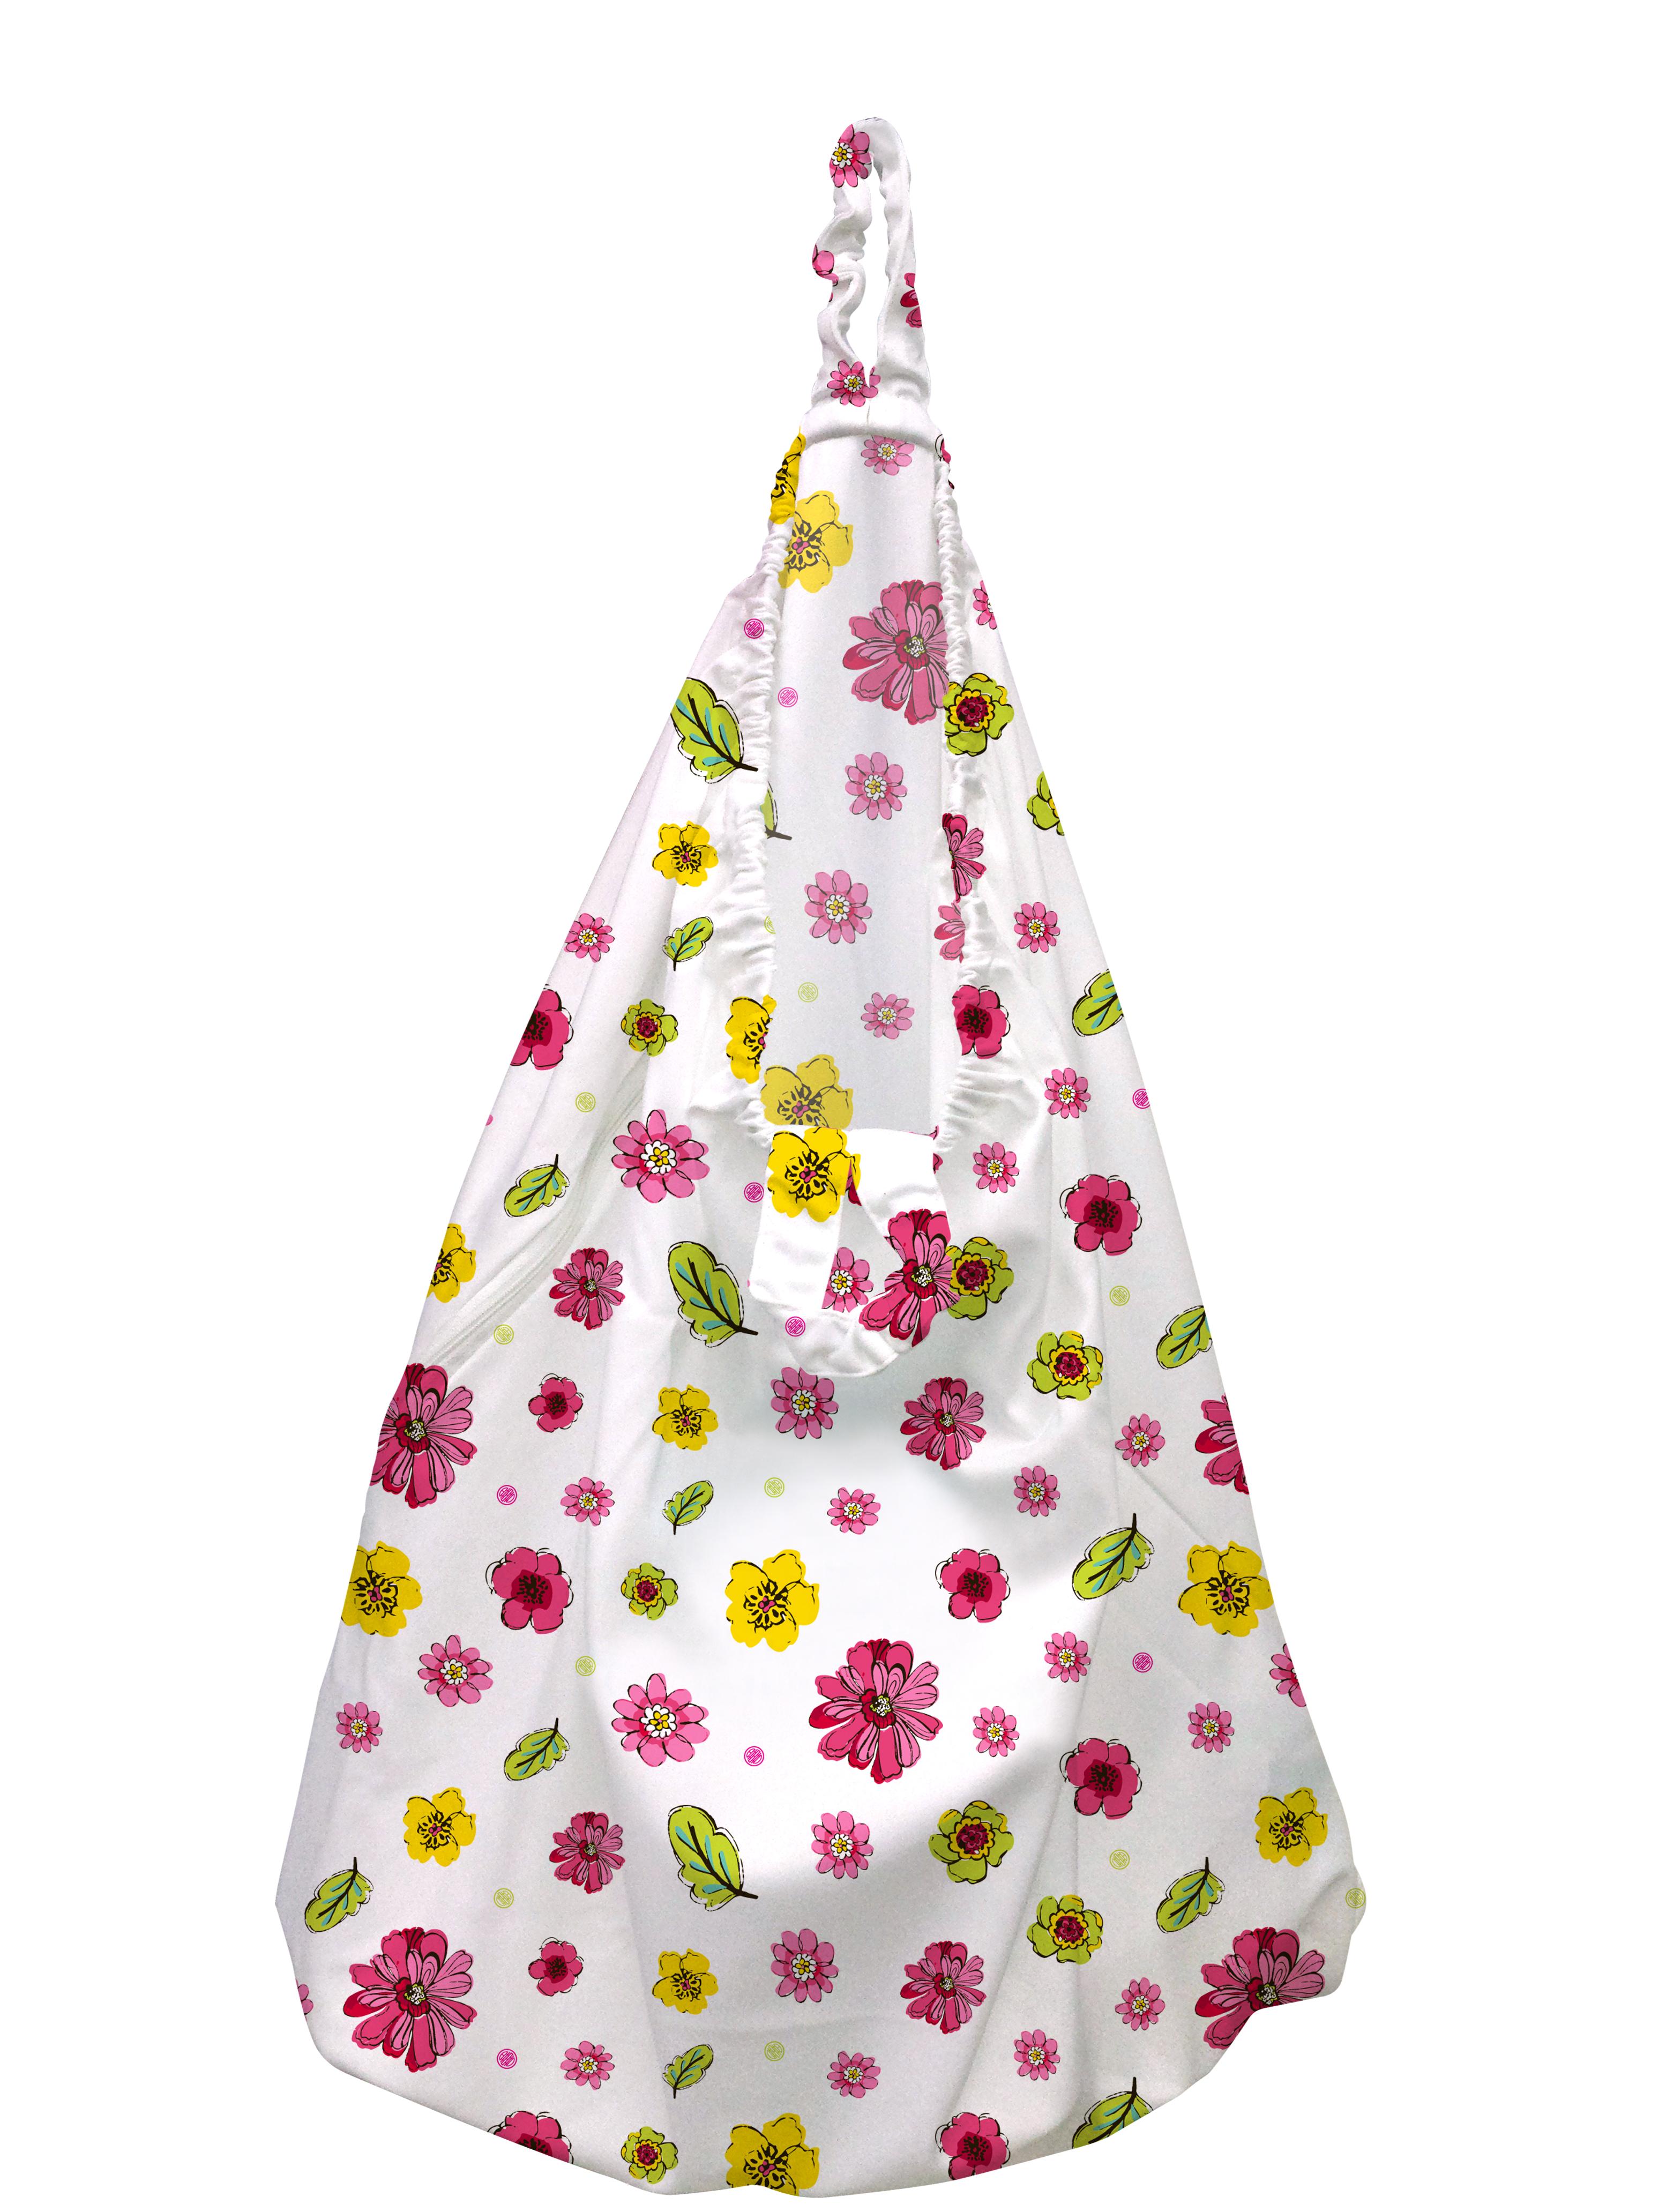 CB Diaper Pail Blooms